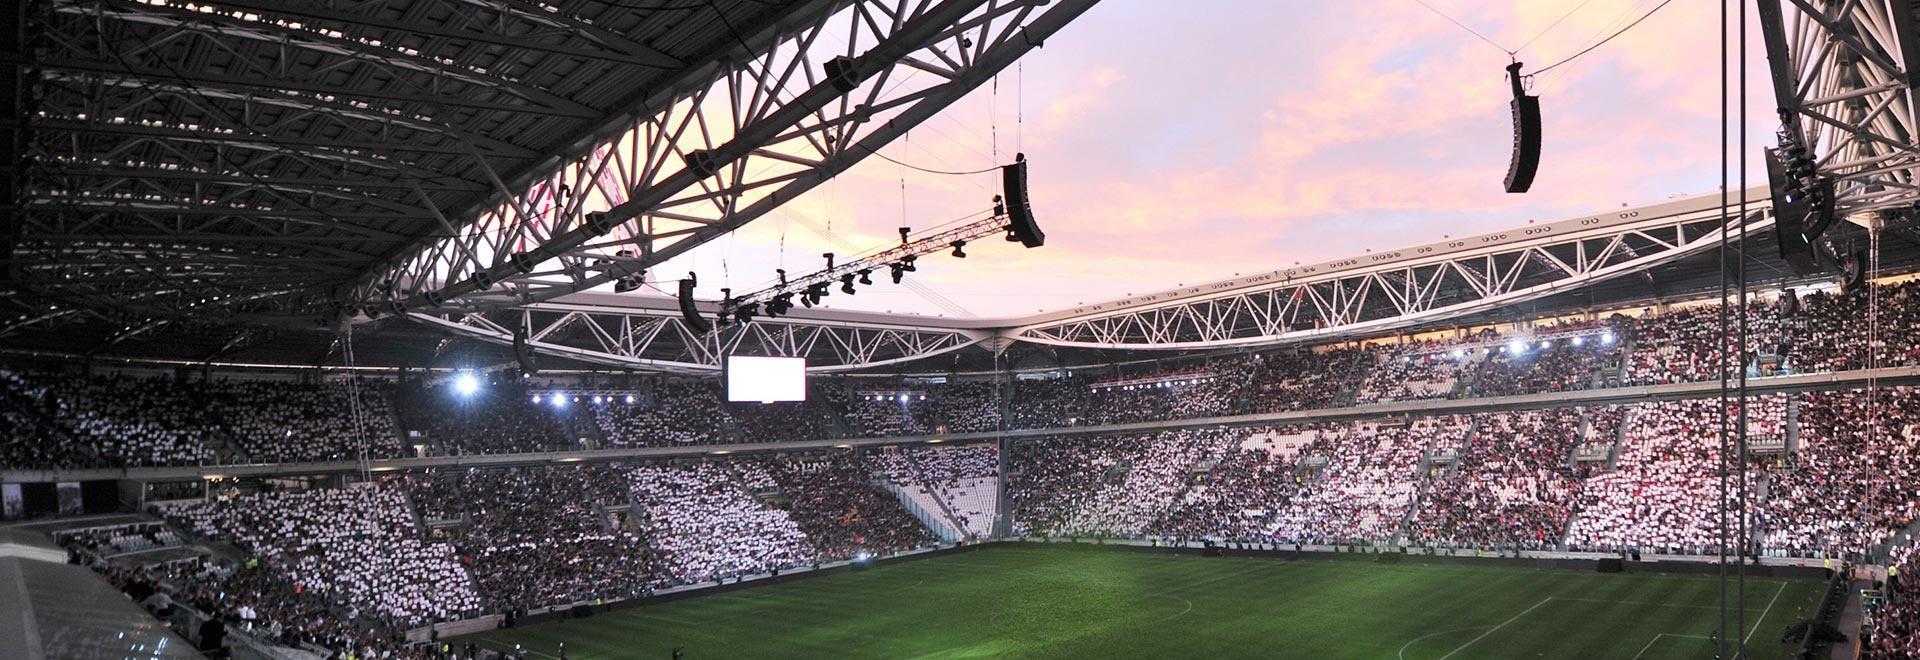 Juventus - Cagliari. 11a g.